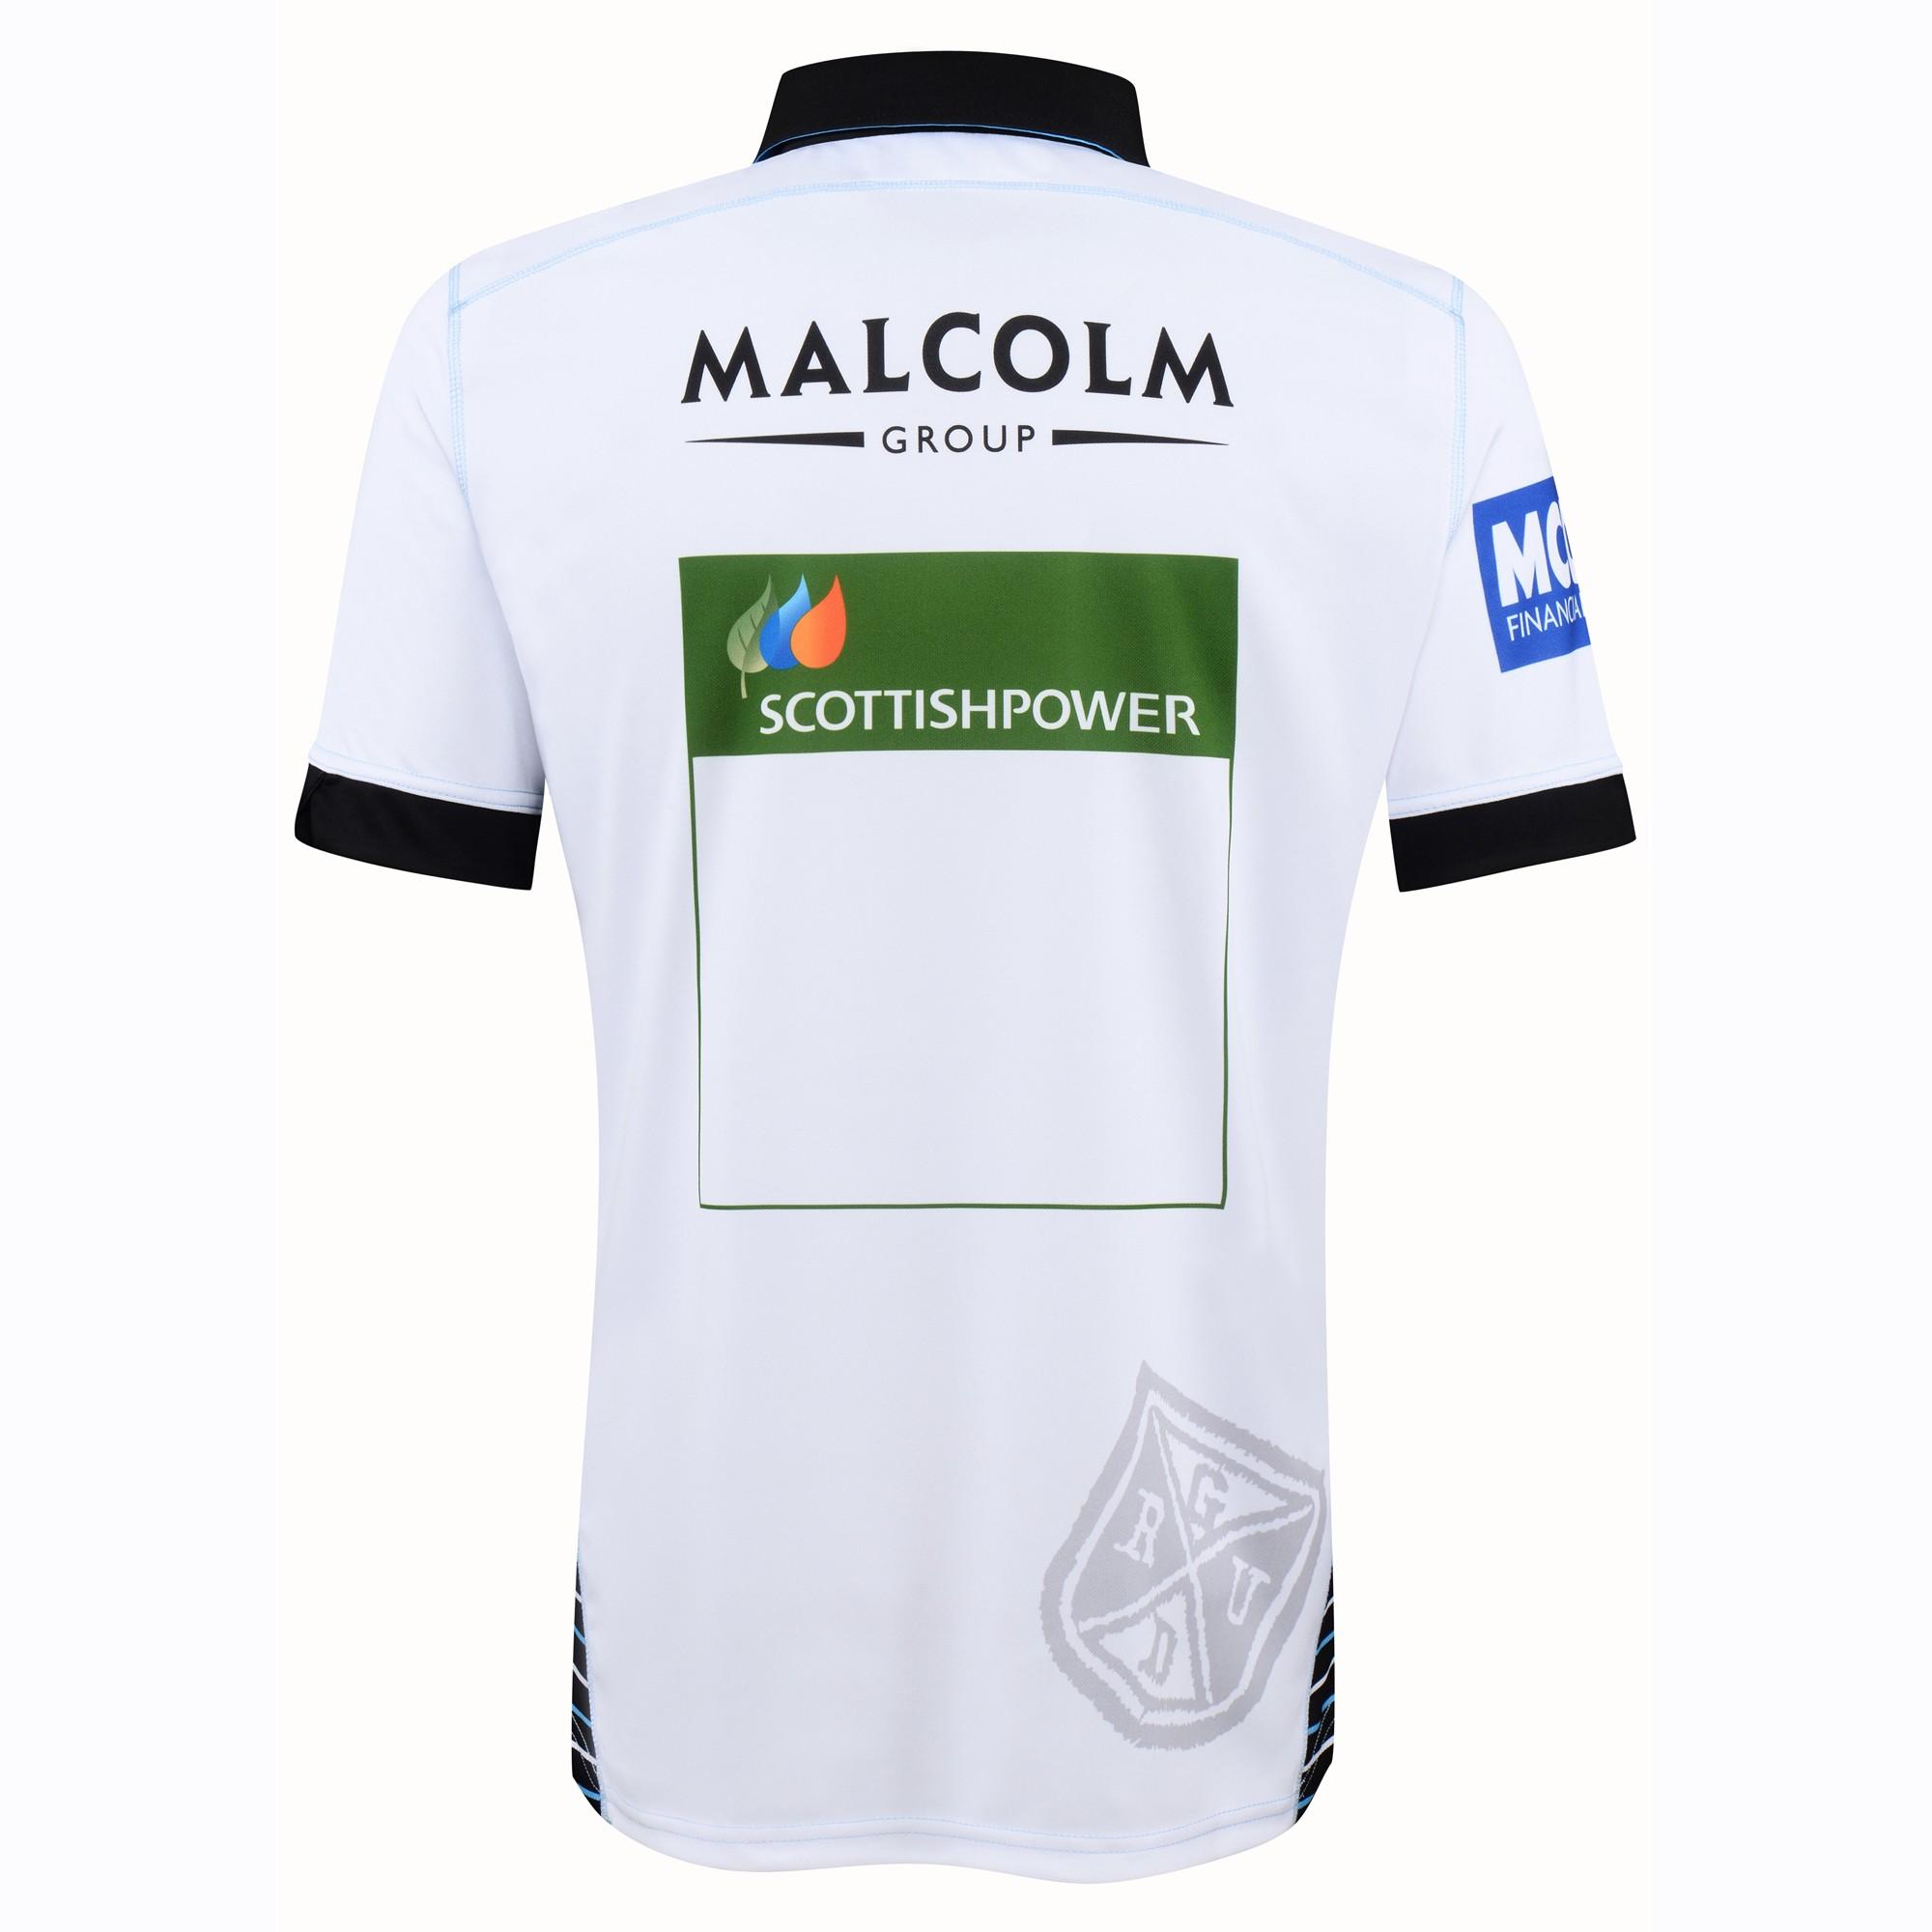 797c7e0f1 2016-2017 Glasgow Warriors Alternate Pro Rugby Shirt  58088314  -  Uksoccershop